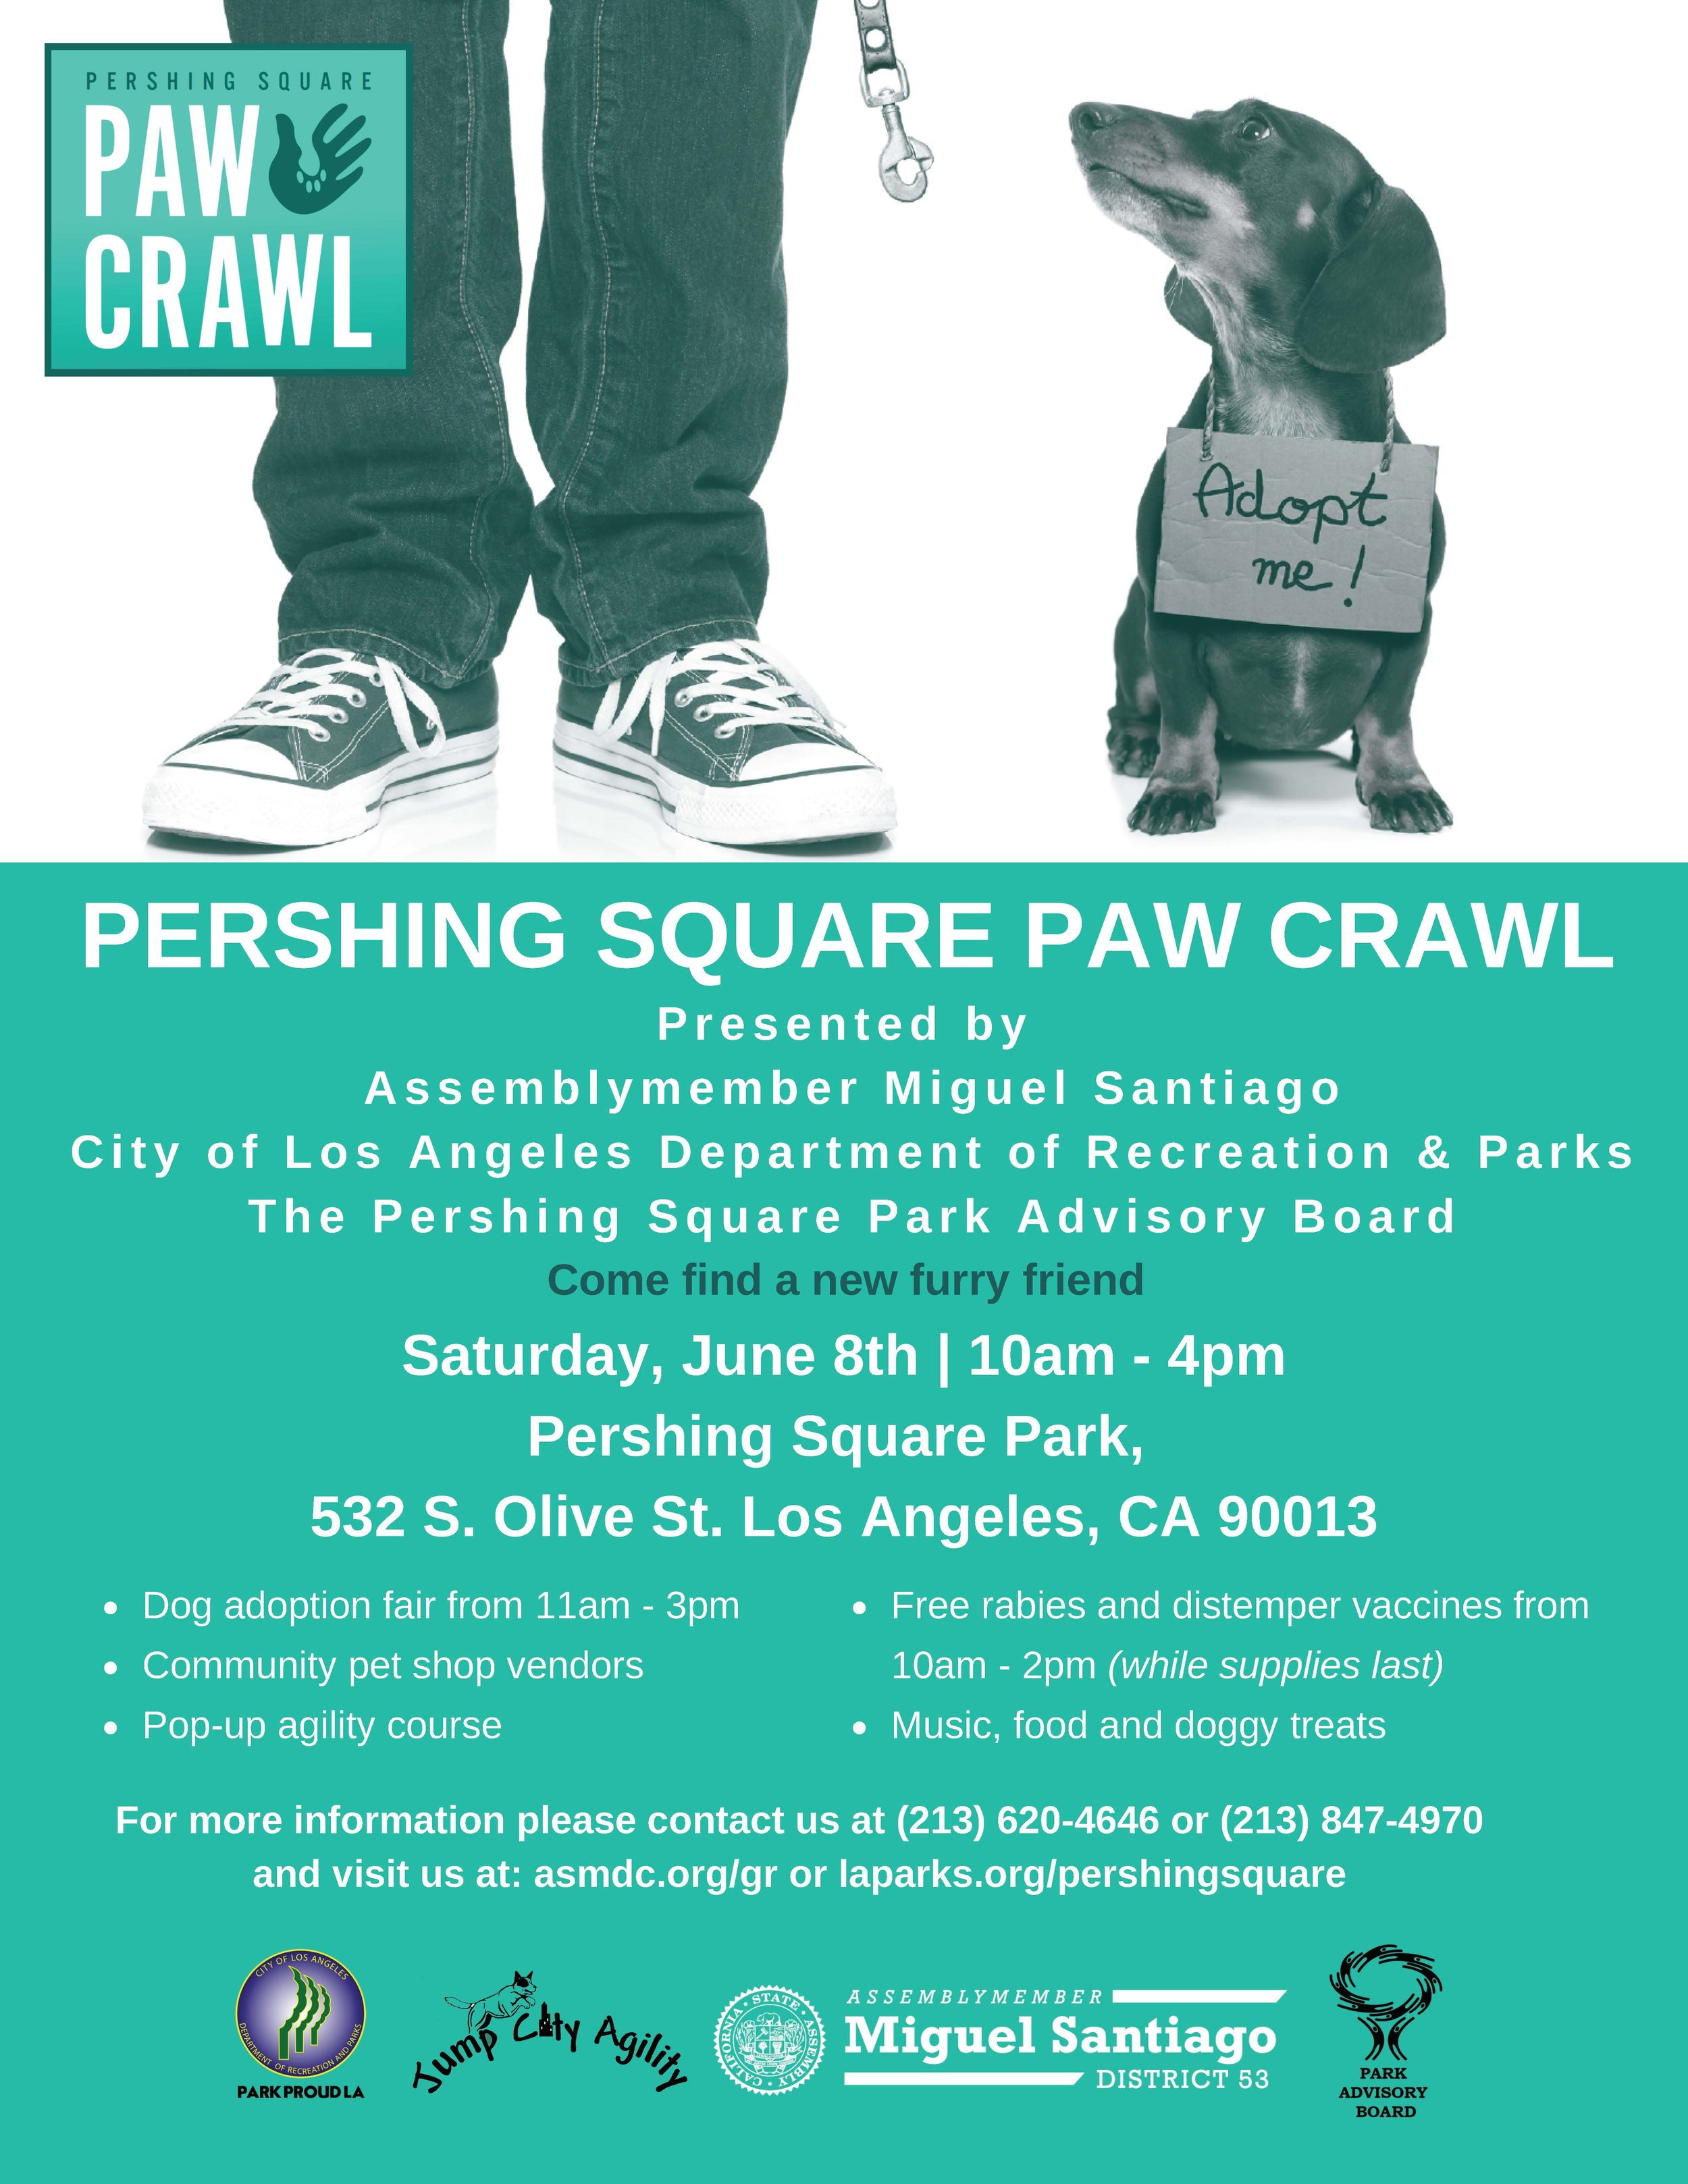 Paw Crawl Flyer.jpg